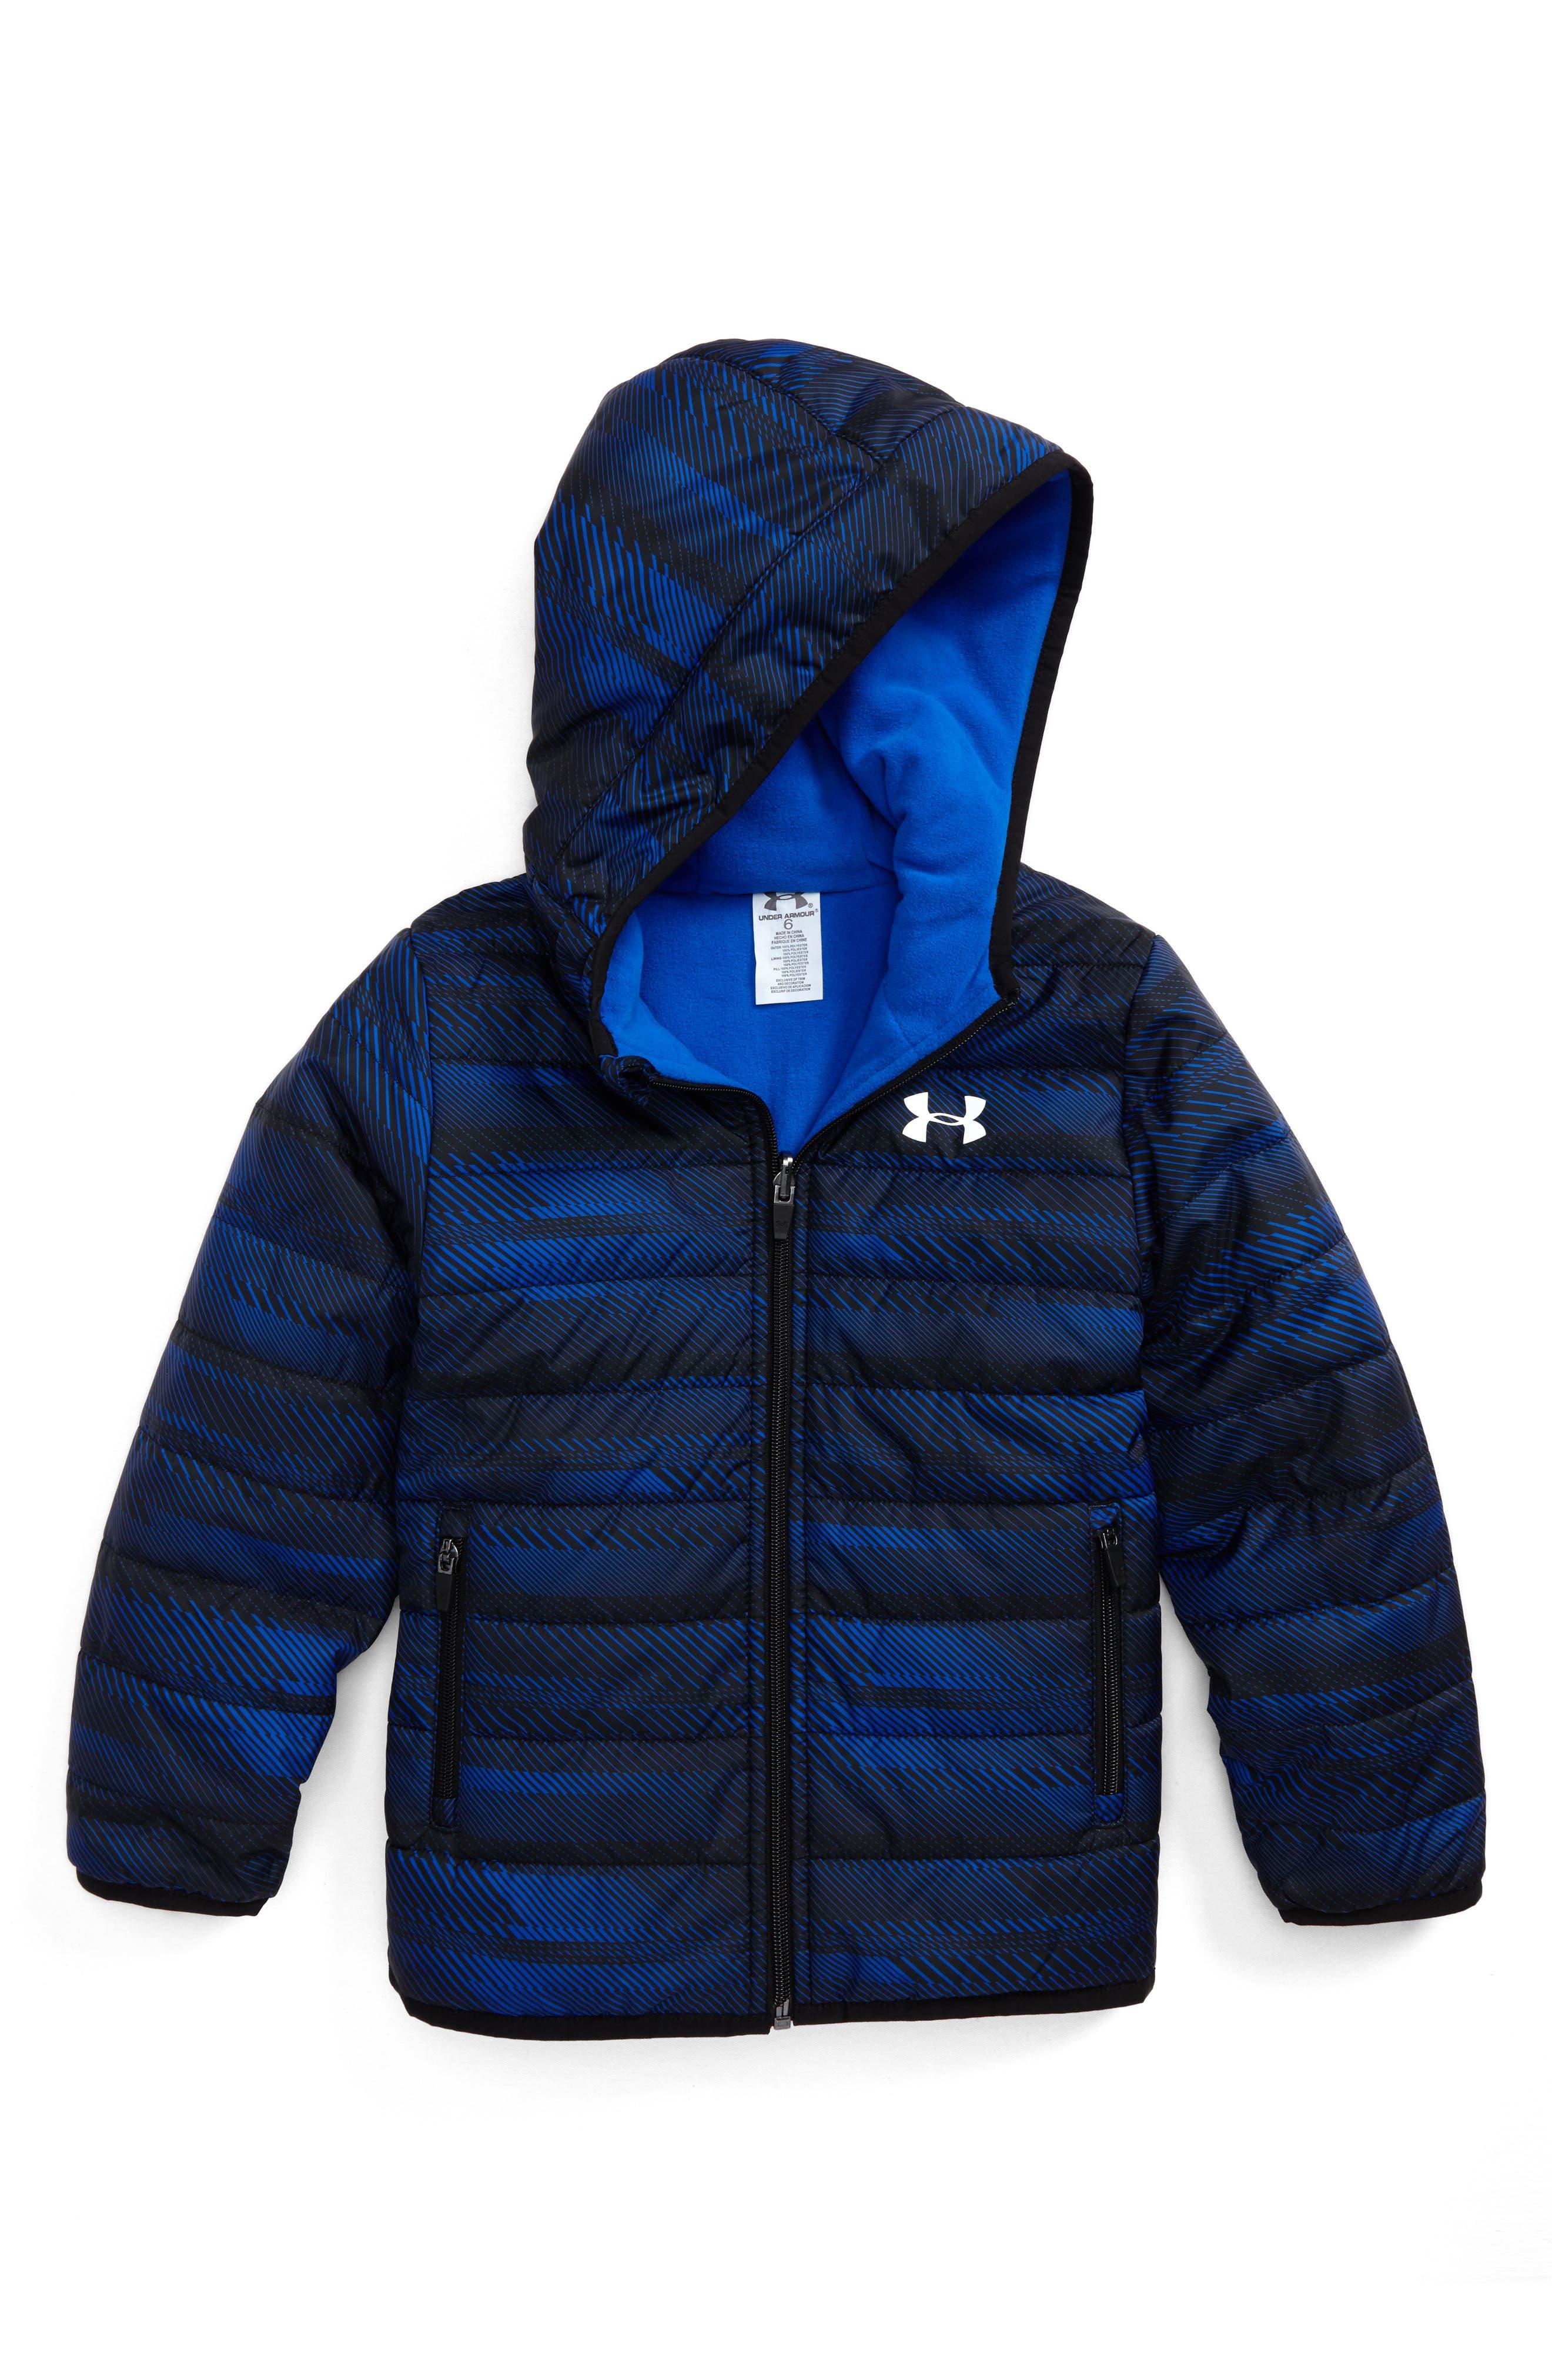 Speedlines ColdGear<sup>®</sup> Reversible Puffer Jacket,                             Main thumbnail 1, color,                             410